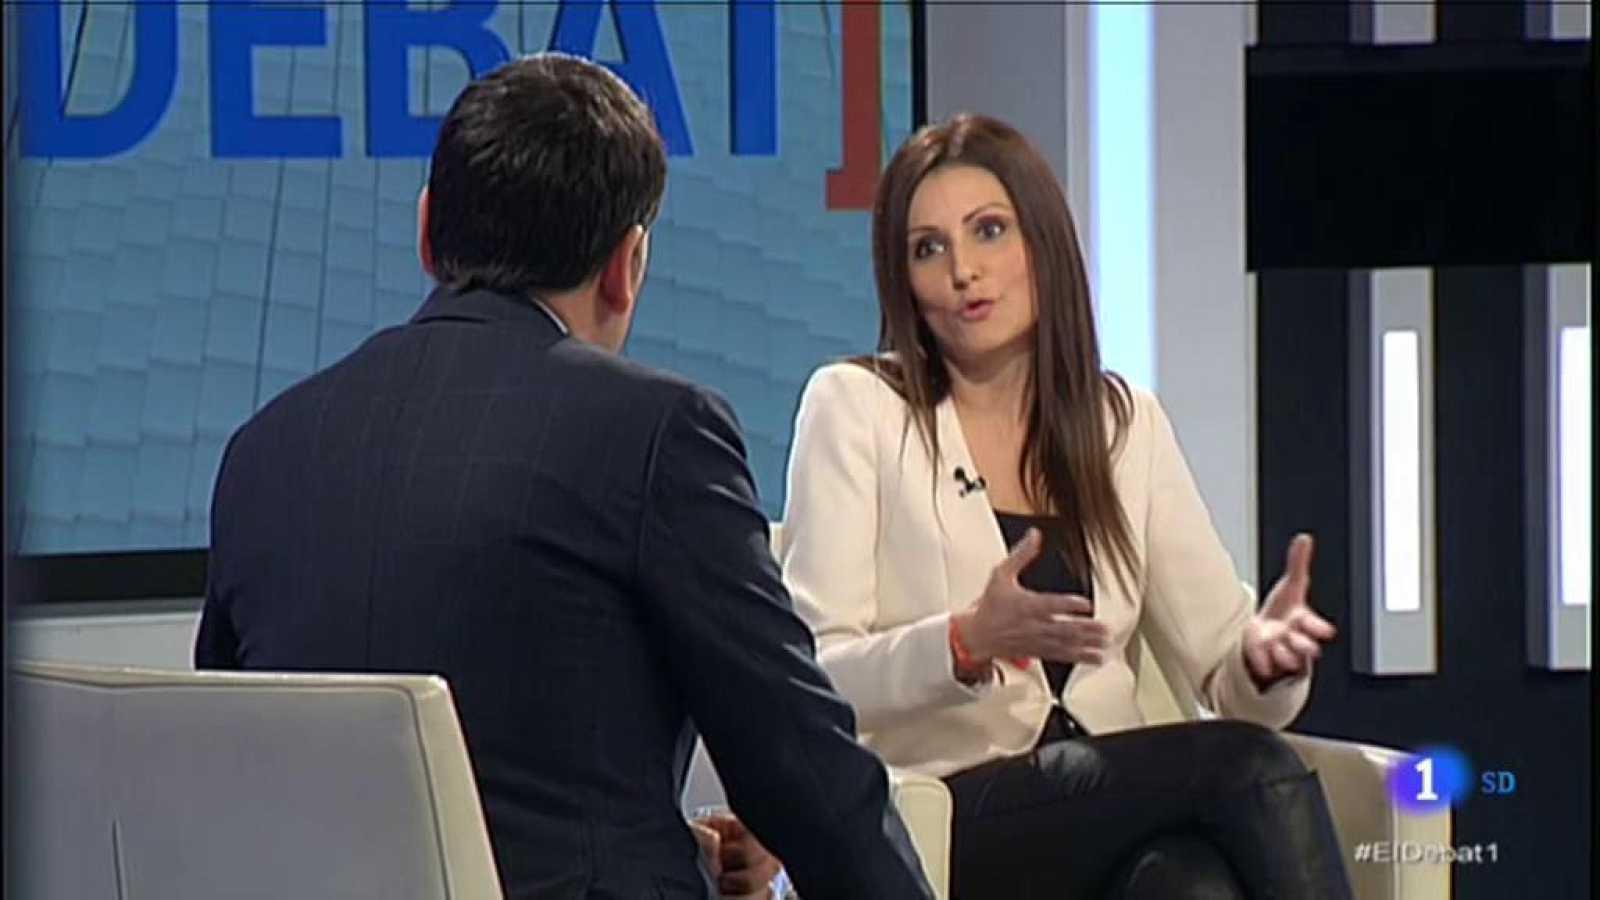 El Debat de La 1 - Lorena Roldán, de C's, censura la mesa de diàleg pactada entre Pedro Sánchez i ERC